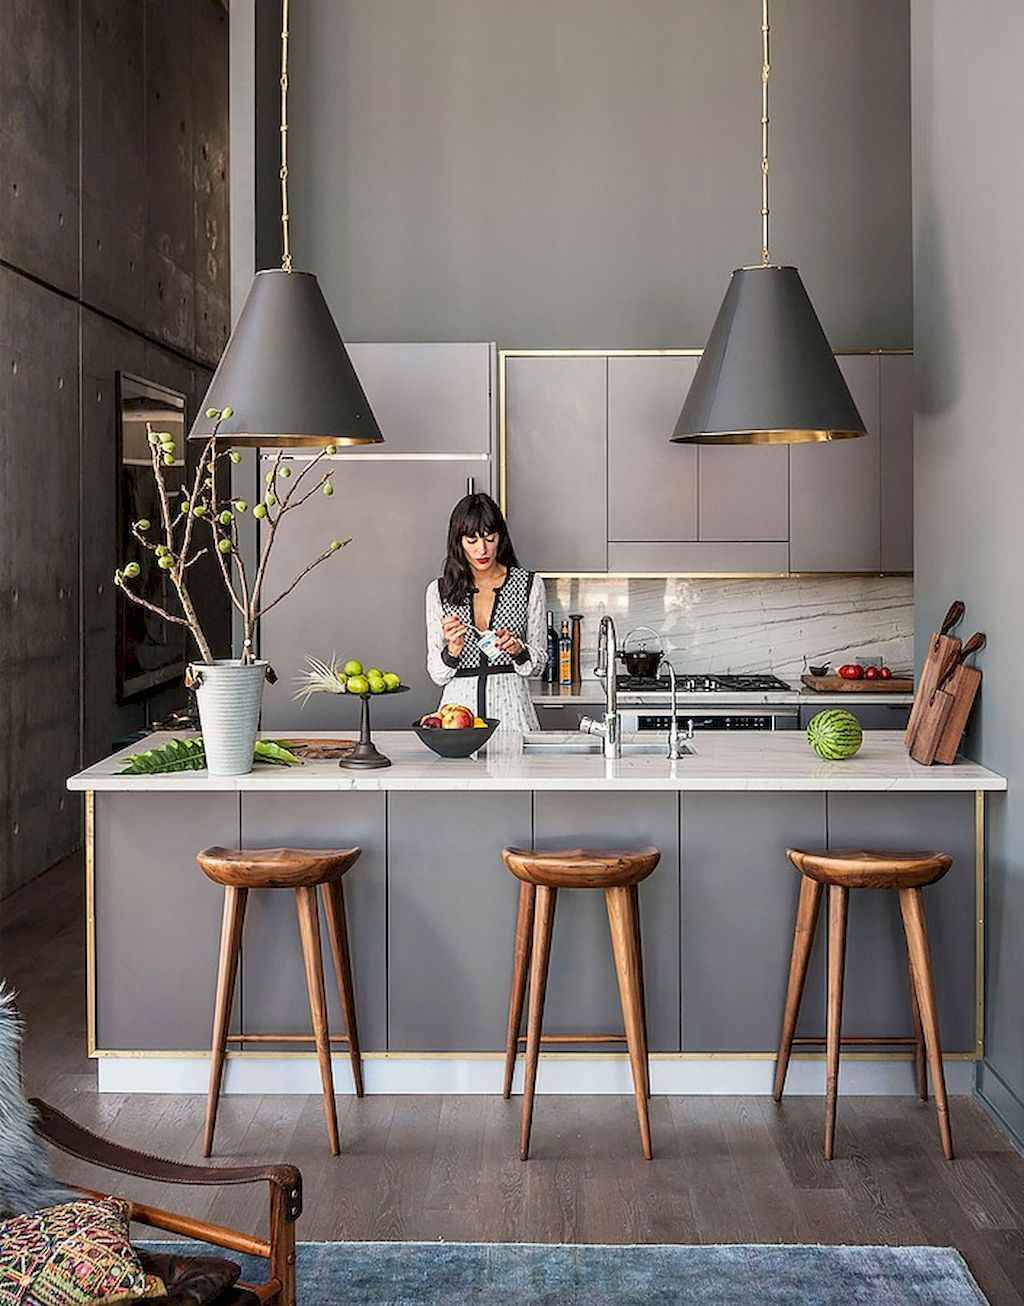 70 Cool Modern Apartment Kitchen Decor Ideas 25 Roomadness Com